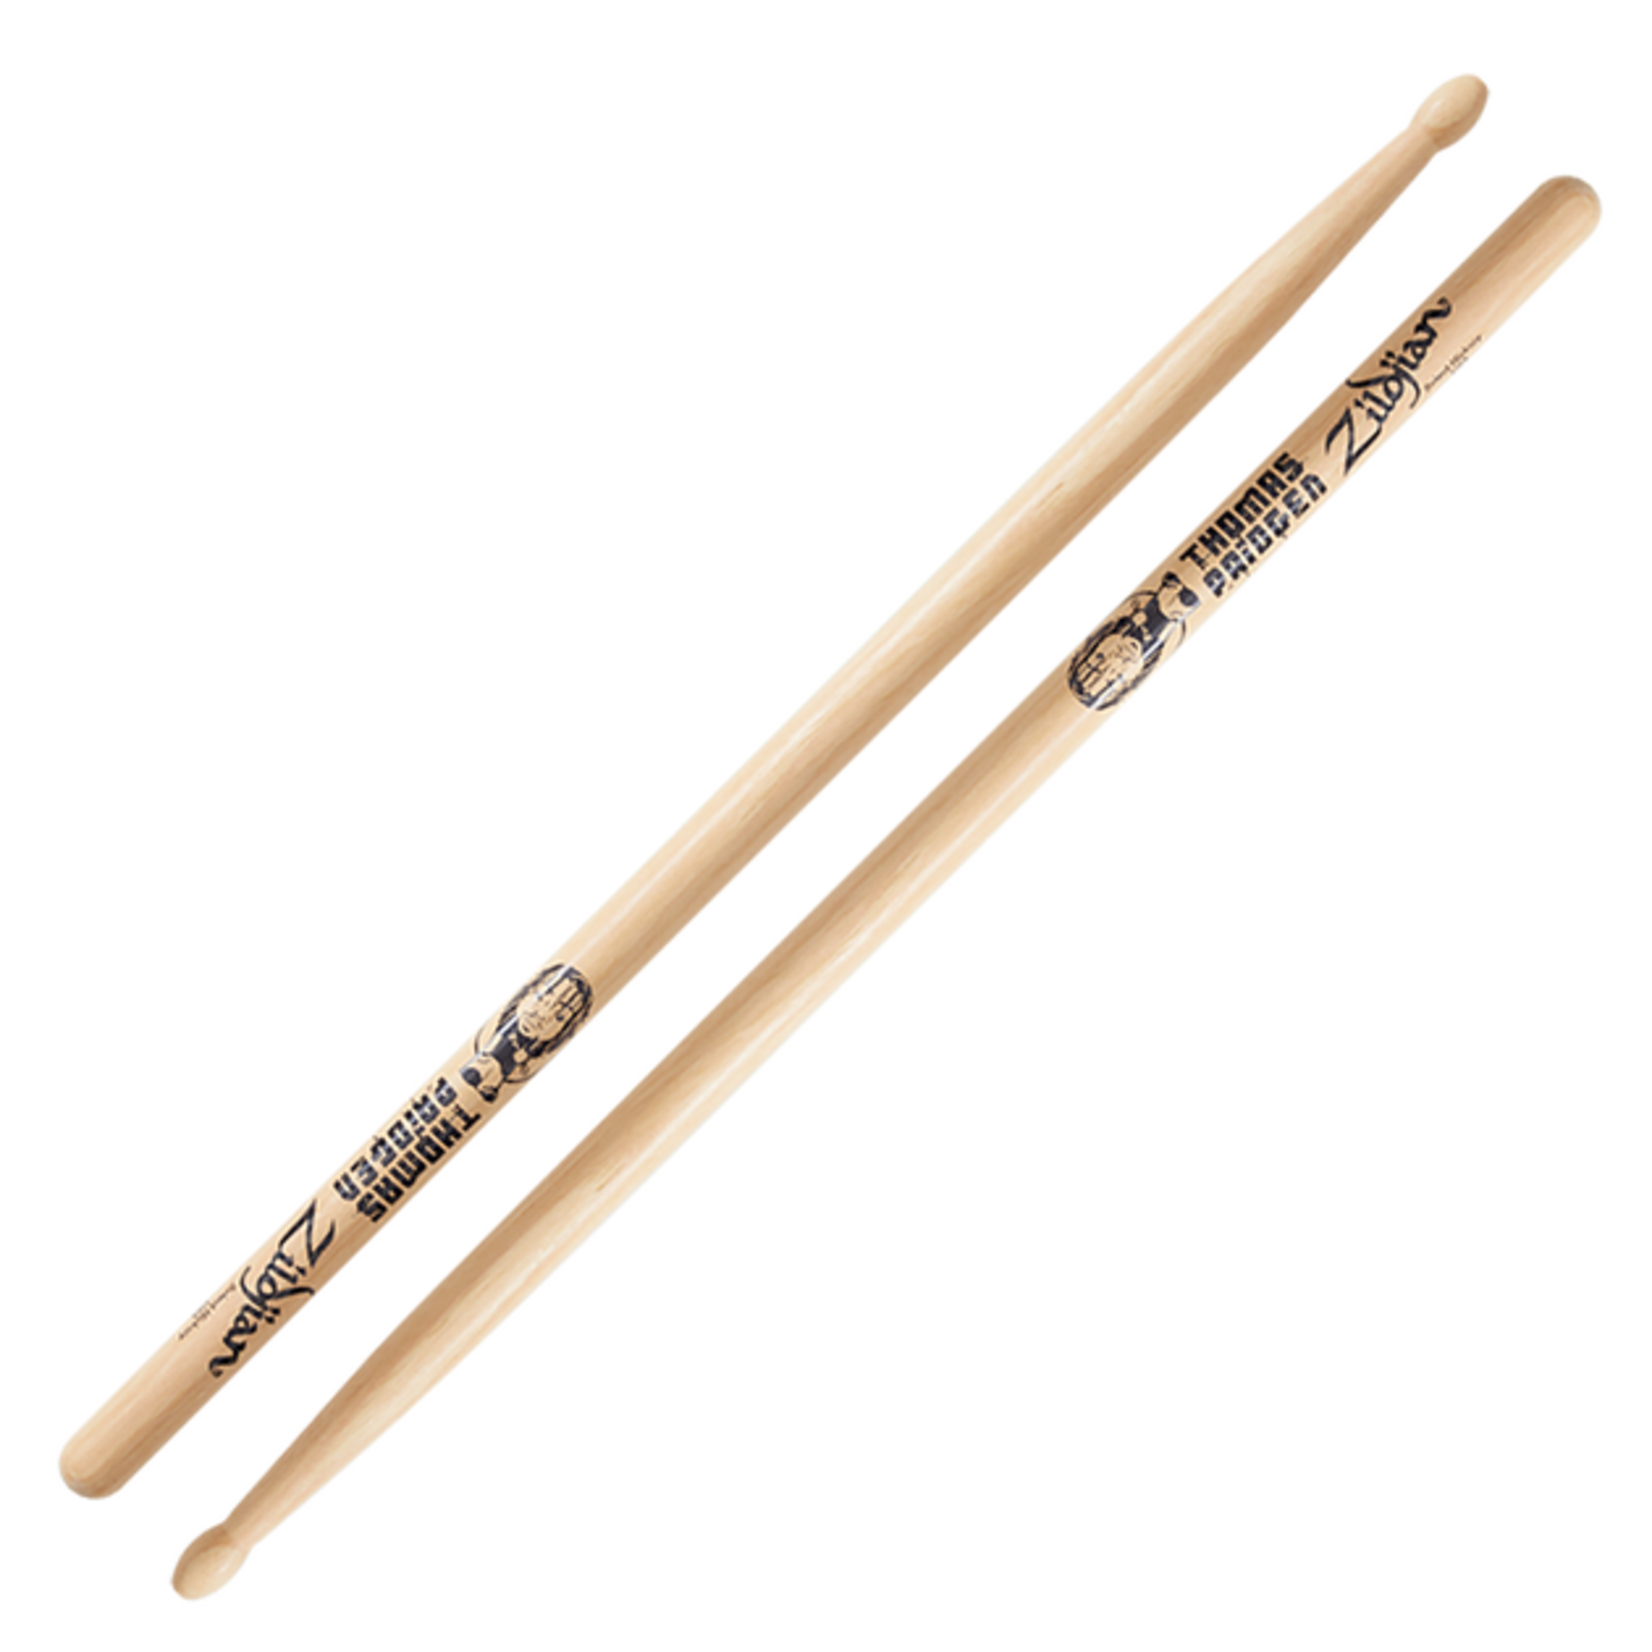 Zildjian Zildjian Thomas Pridgen Artist Series Drumsticks